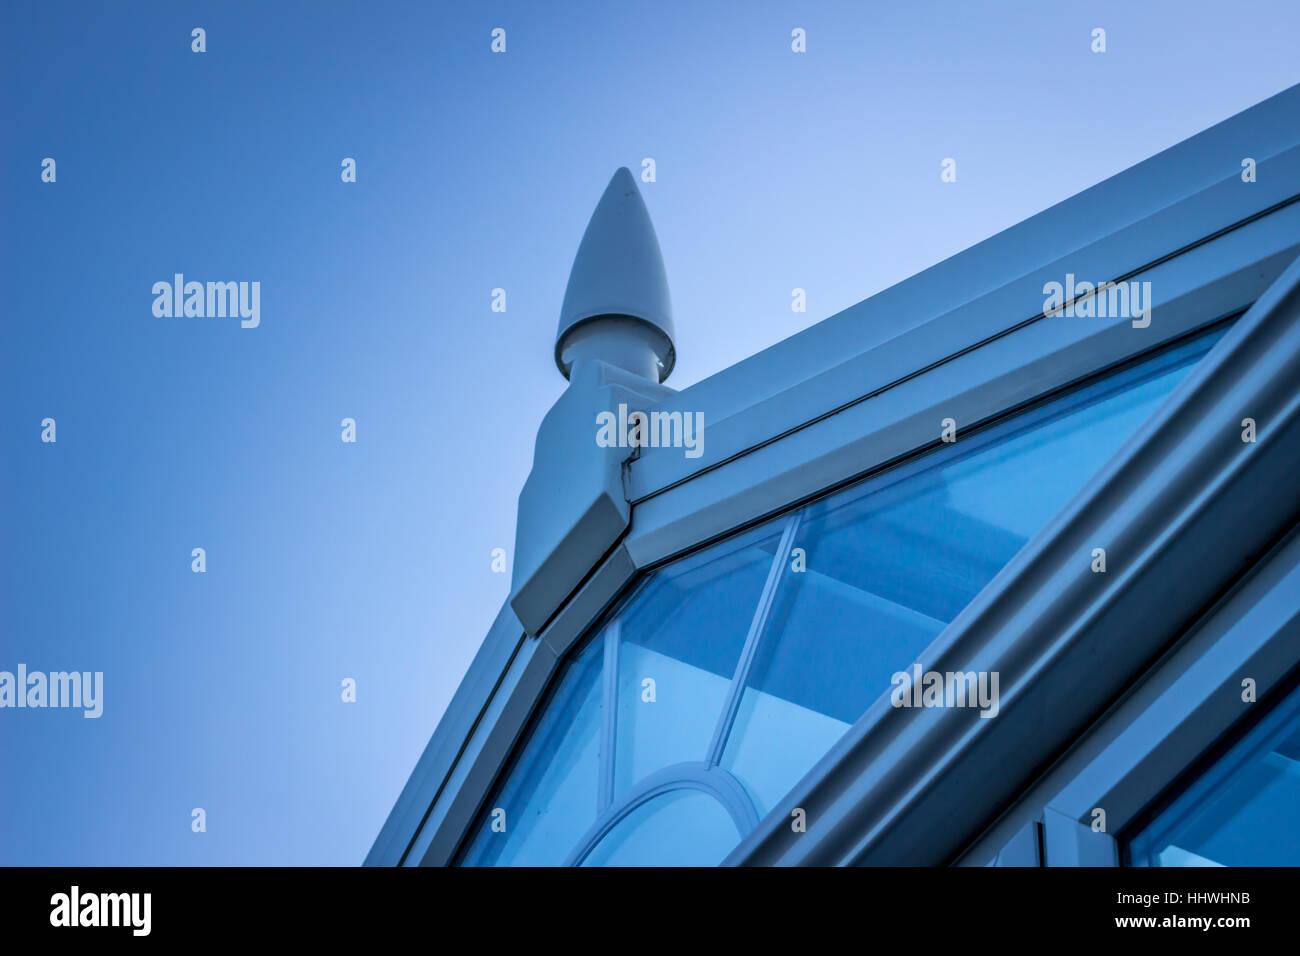 Building Conservatory Frame Imágenes De Stock & Building ...